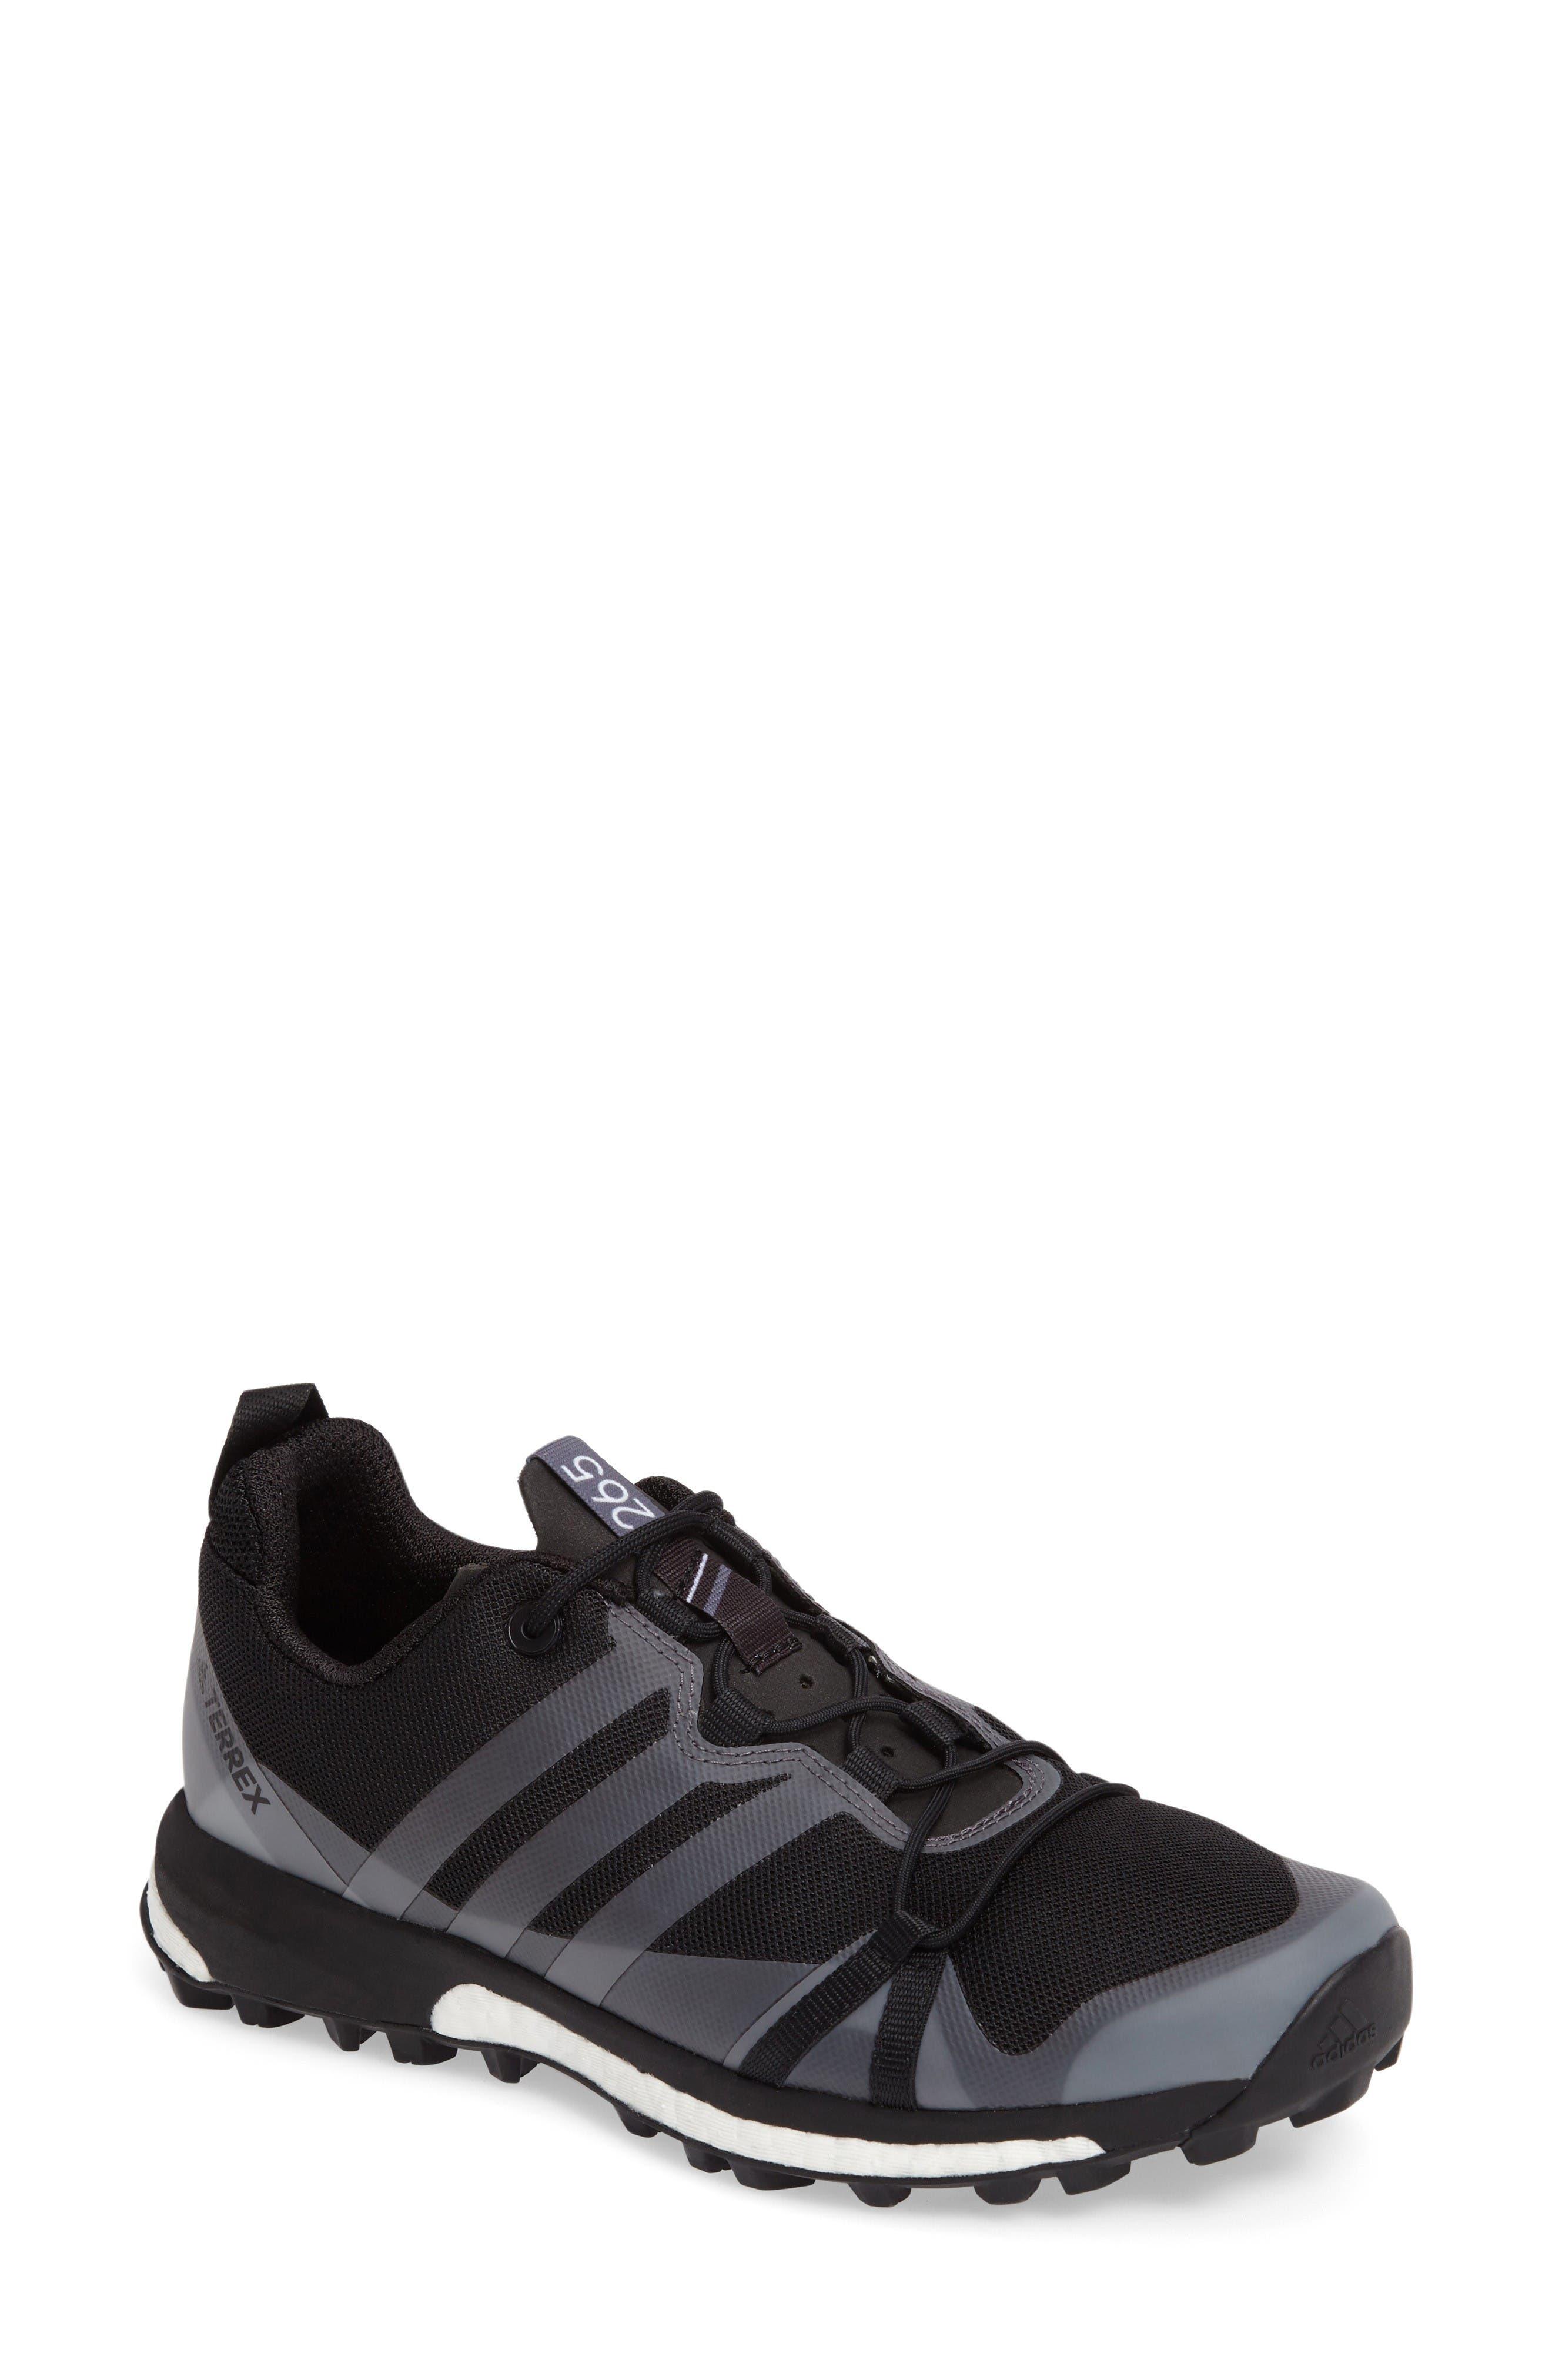 adidas Terrex Agravic GTX Hiking Shoe (Women)